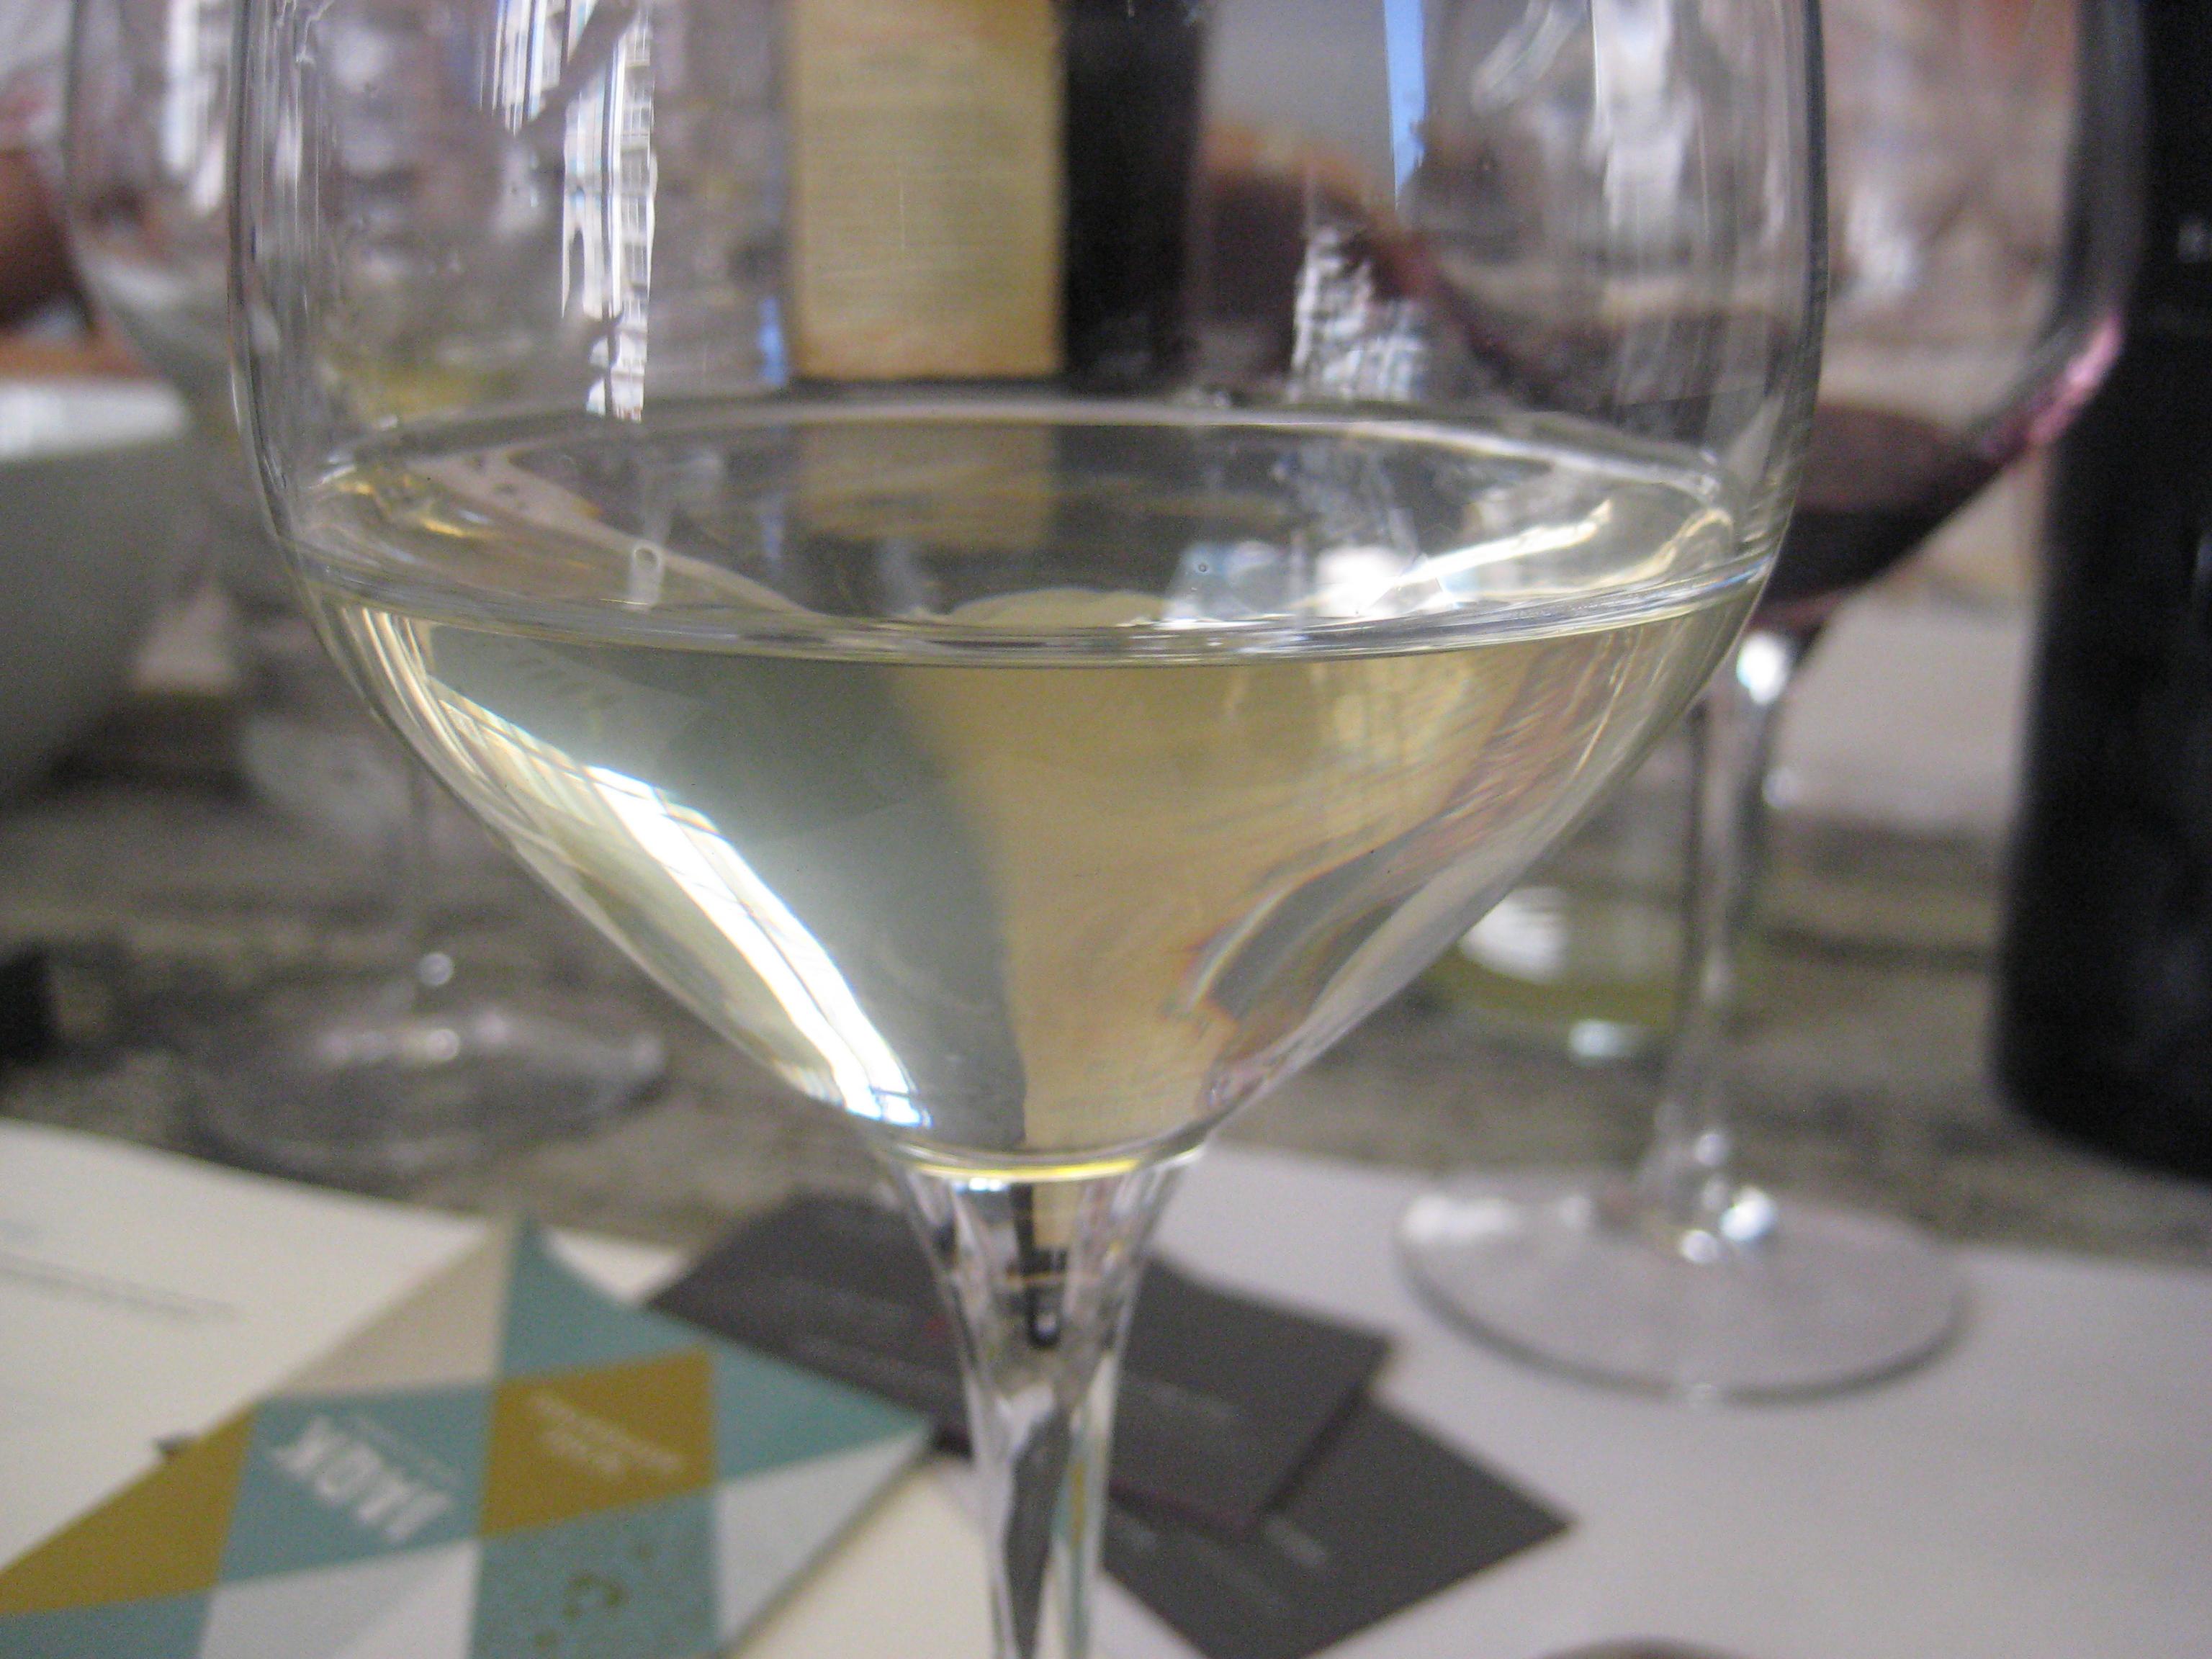 The Sauvignon Blanc was my fav of the whites.